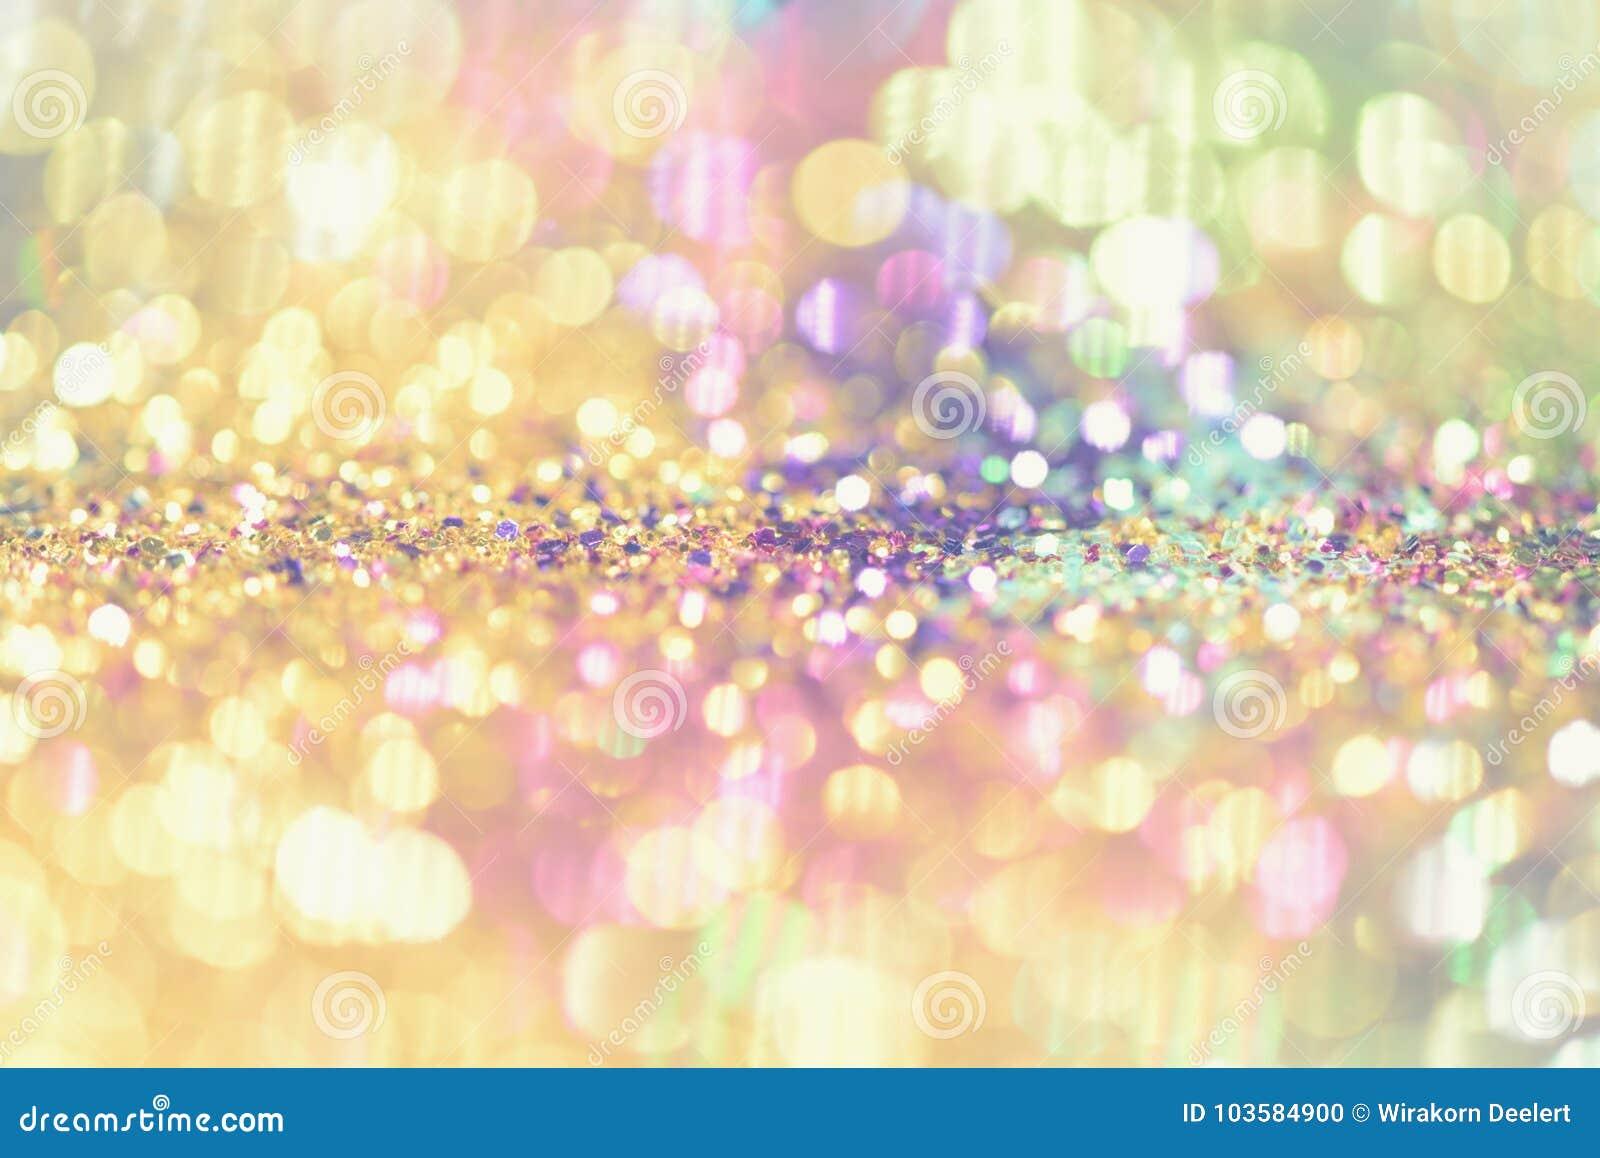 Bokeh Colorfull弄脏了生日、周年、婚礼、除夕或者圣诞节的抽象背景